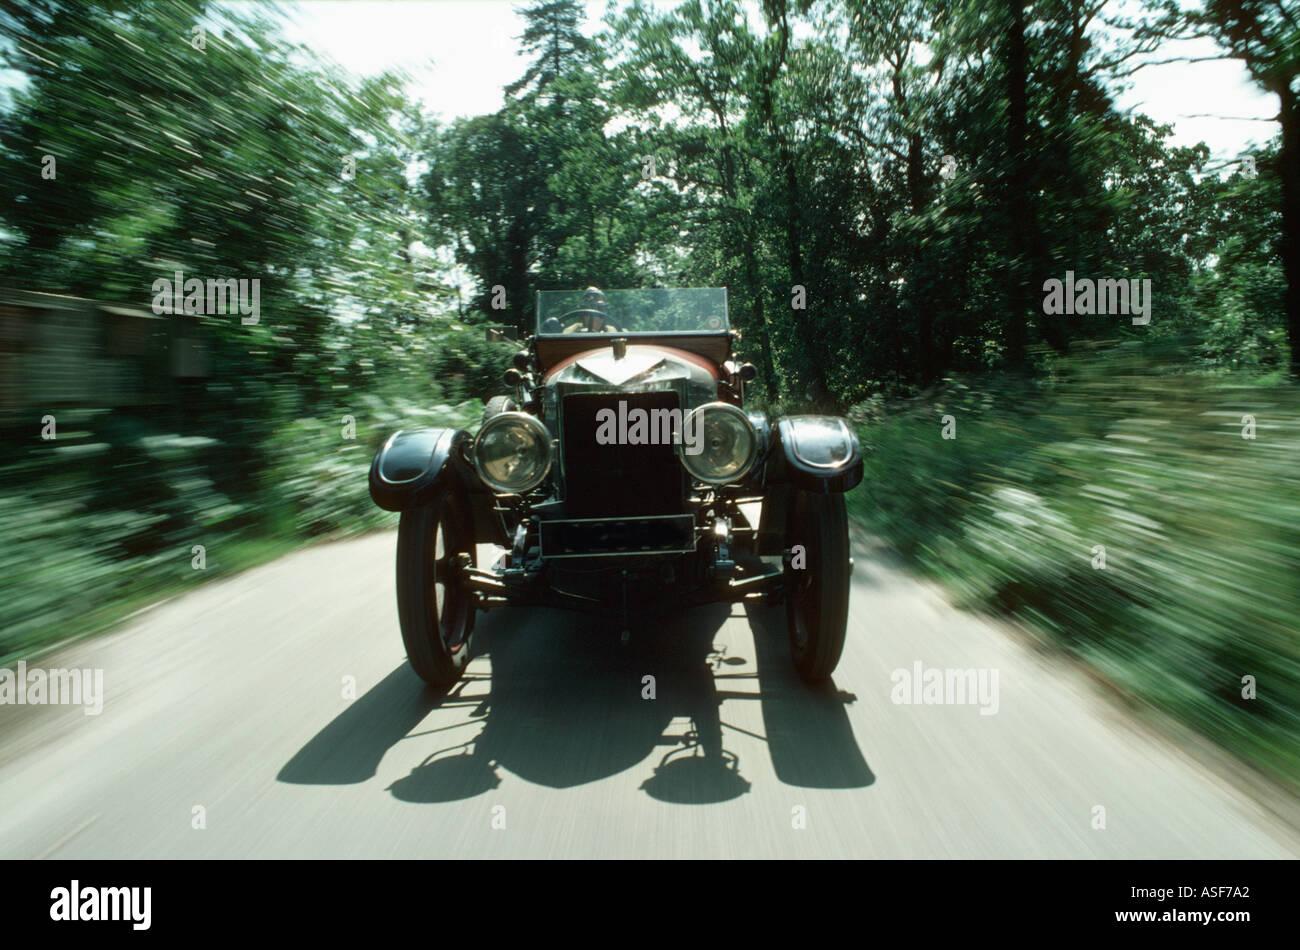 Vauxhall Prince Henry Vintage Car - Stock Image